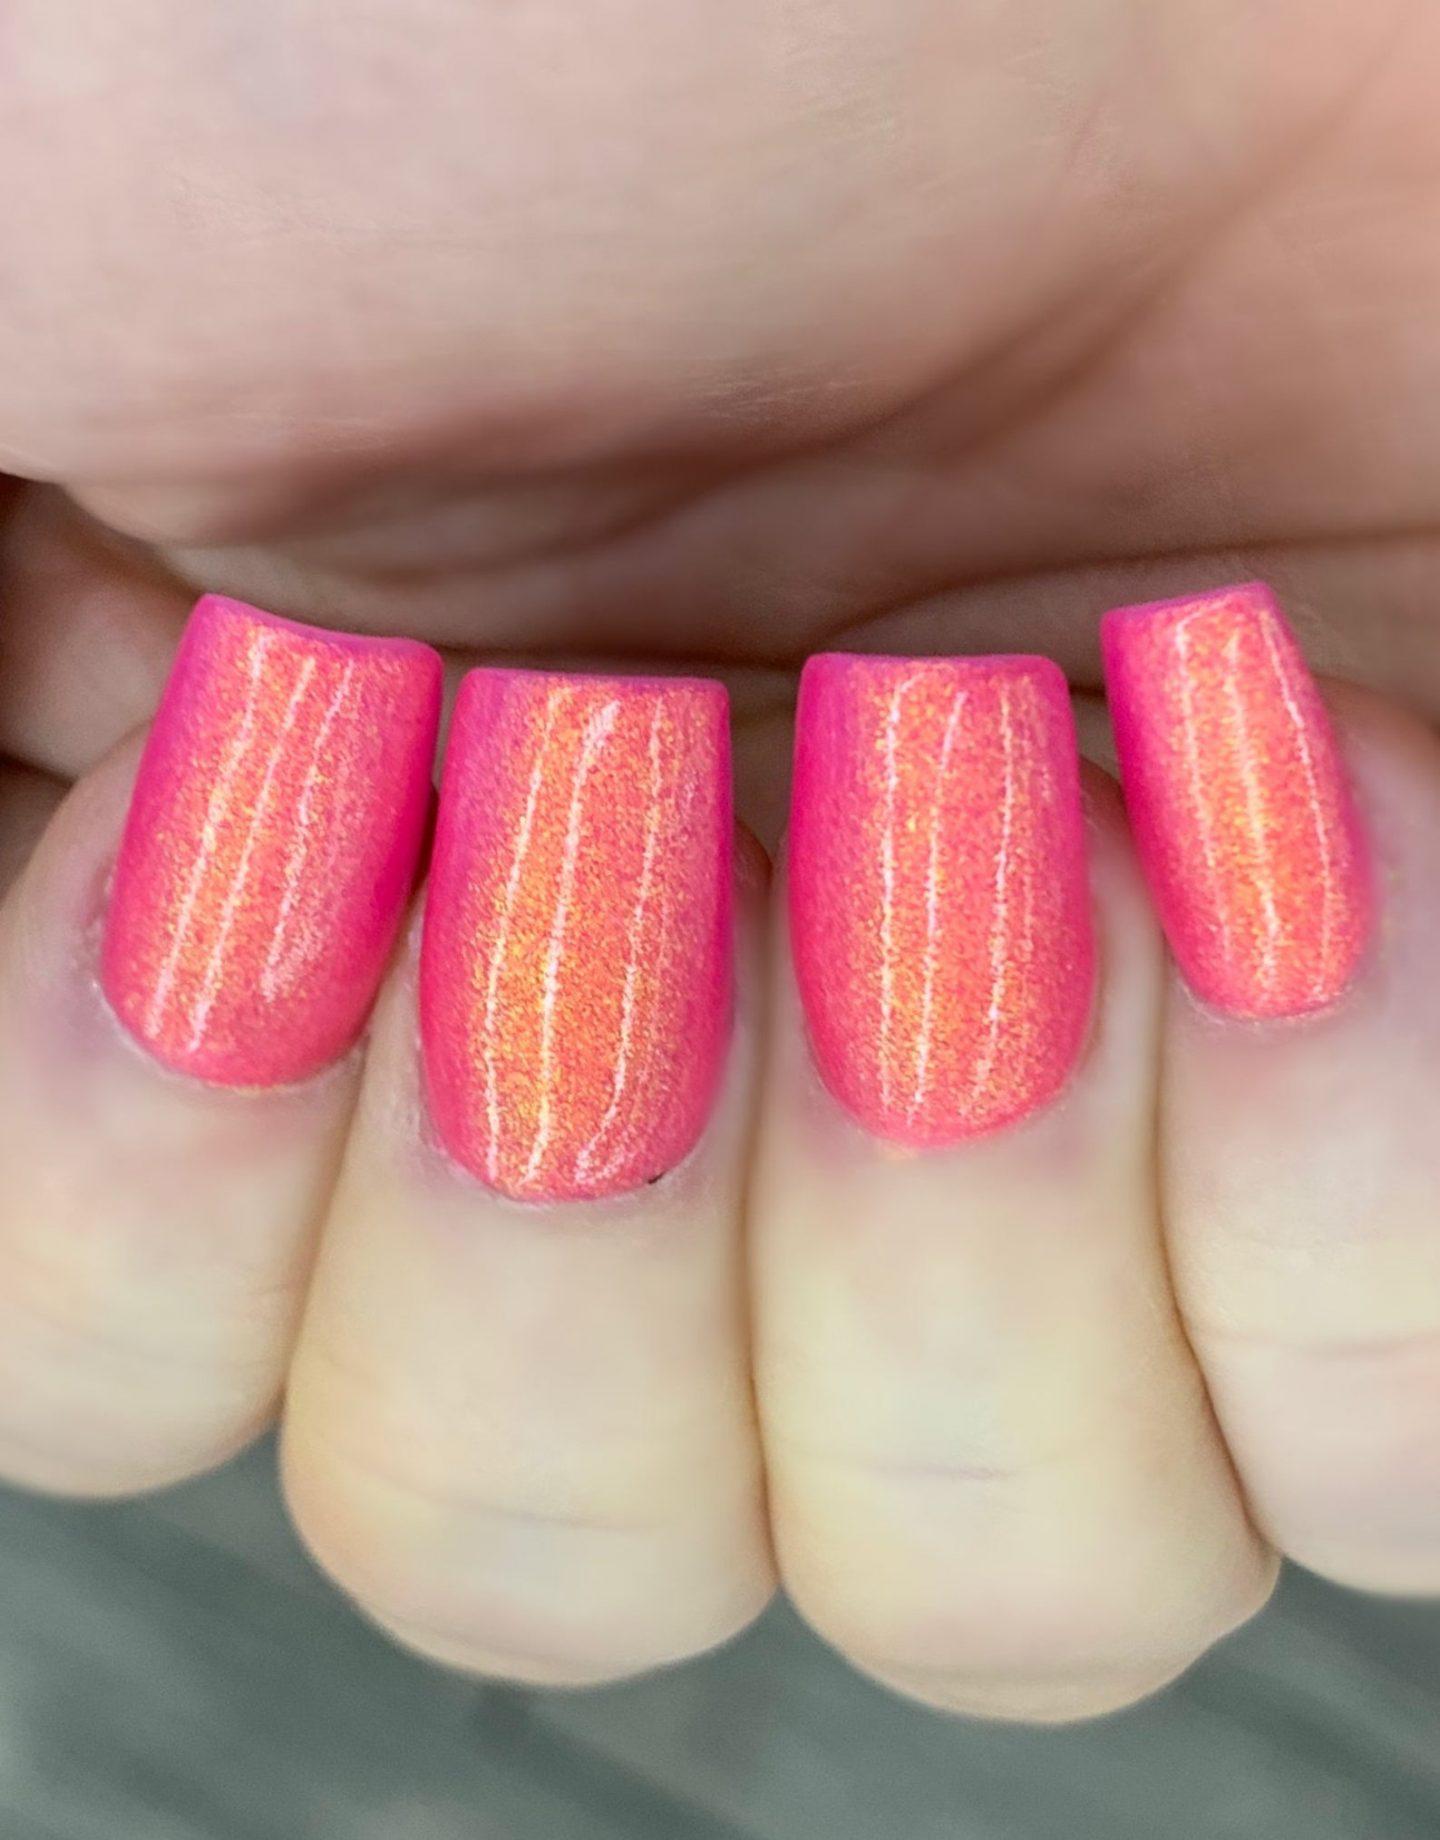 Holographic pink and orange nail polish